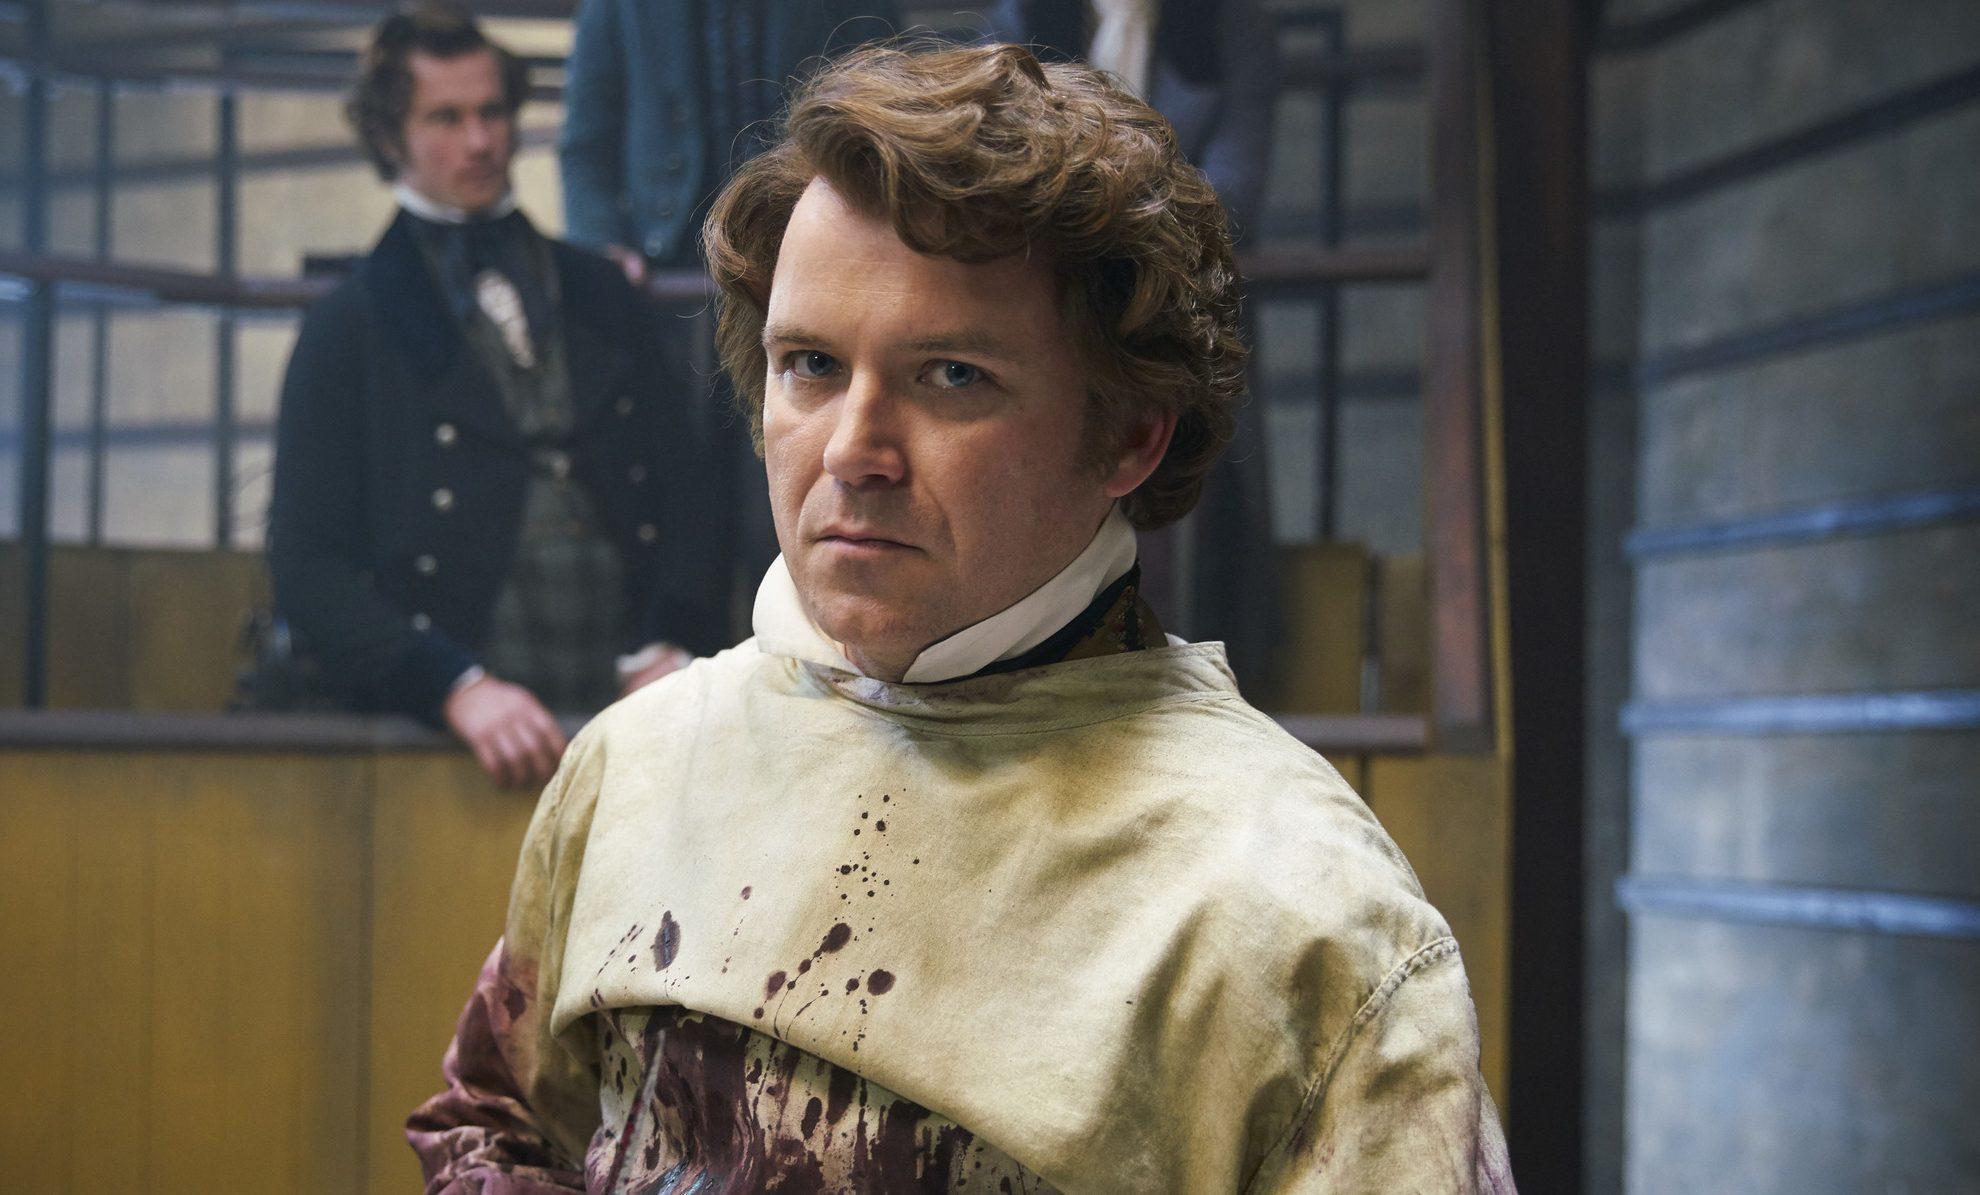 Rory Kinnear as Robert in Quacks (Lucky Giant / Mark Johnson)